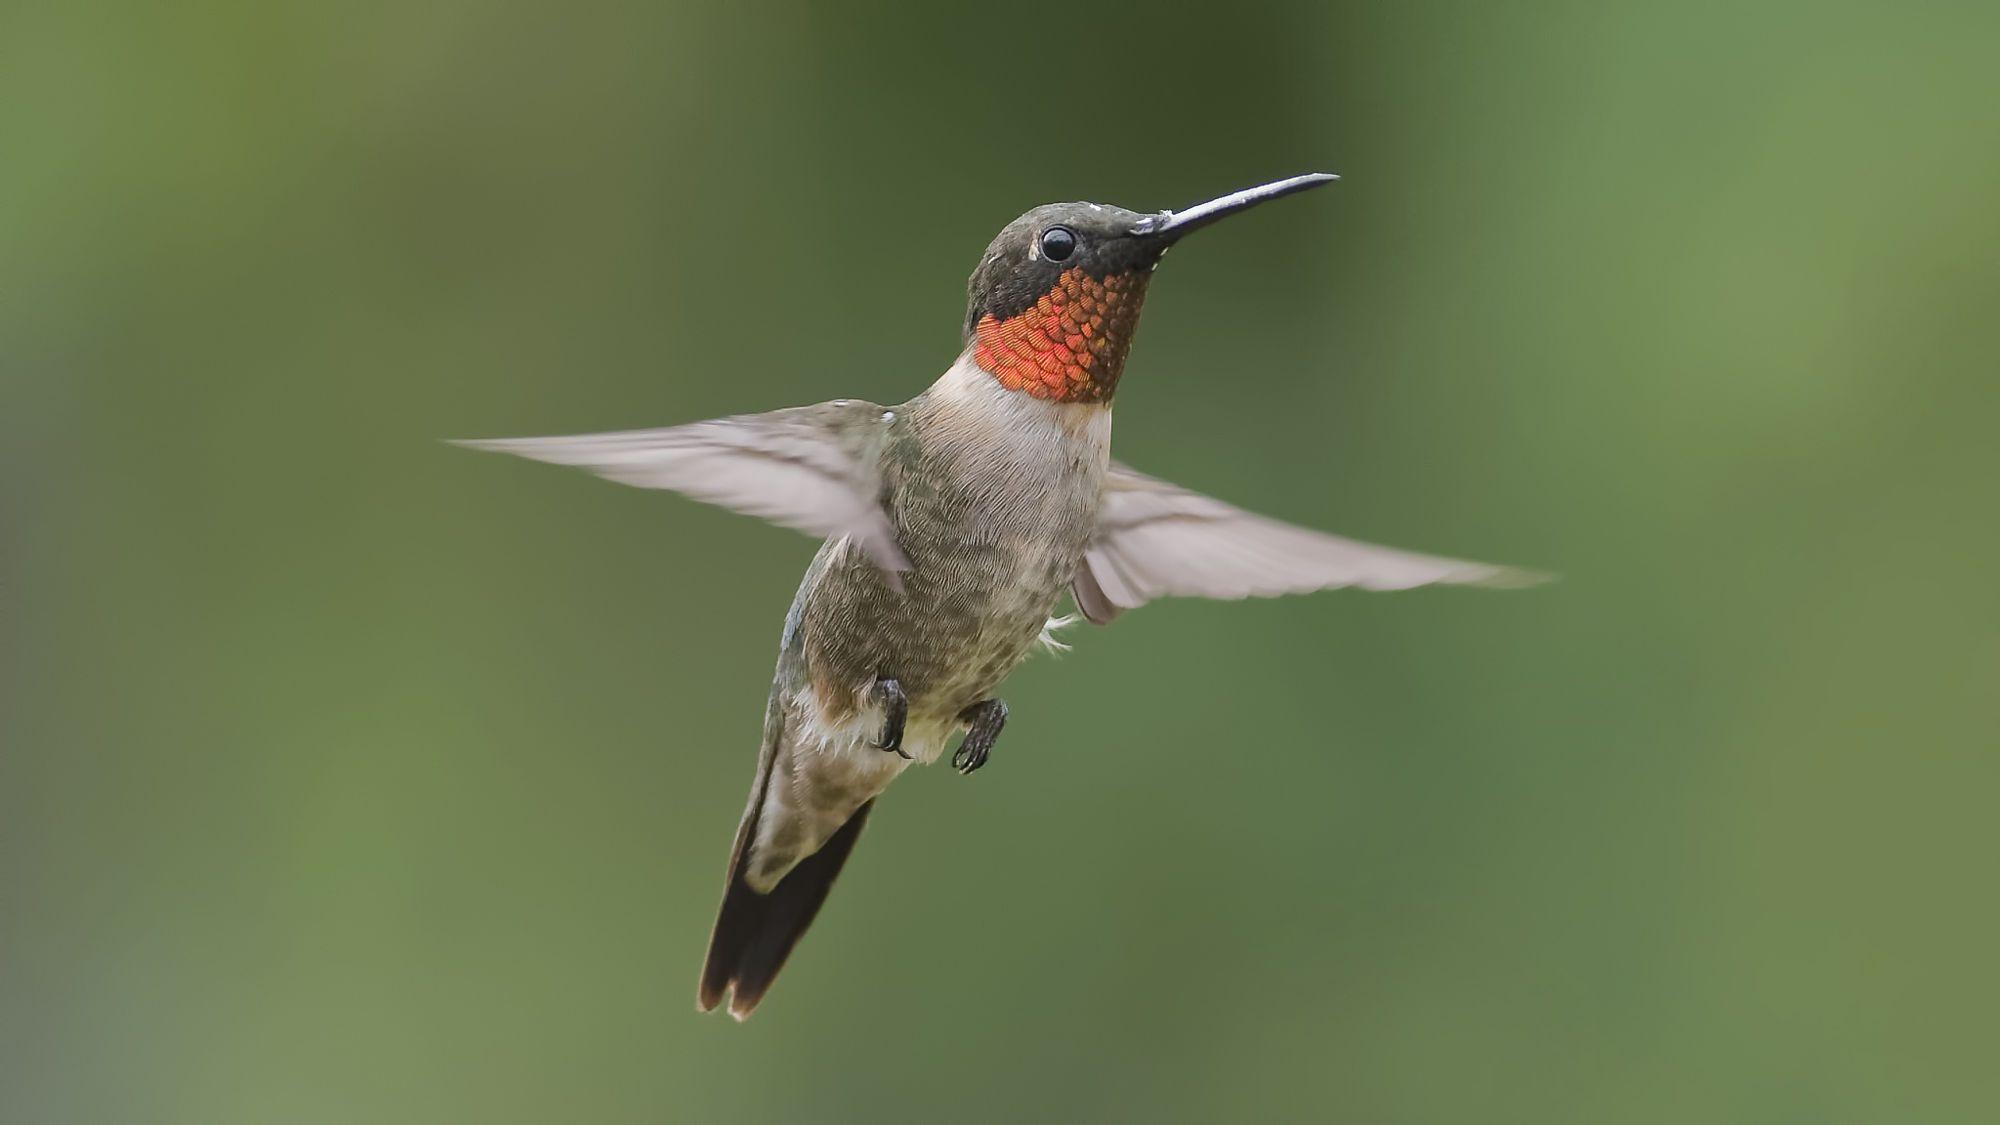 Boys Will Be Boys - Adult male Ruby-throated Hummingbird in flight.